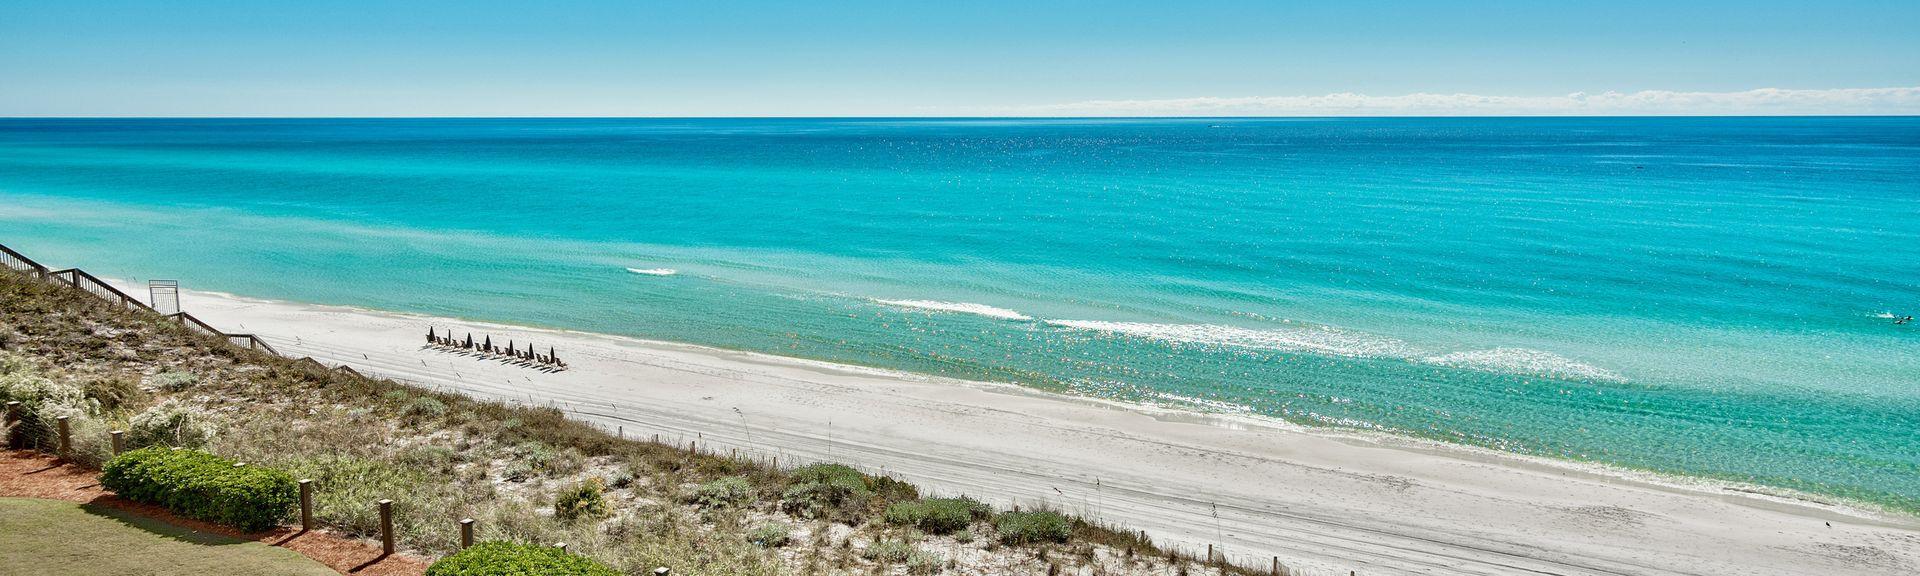 Lakeside at Blue Mountain Beach, Santa Rosa Beach, Florida, Stati Uniti d'America